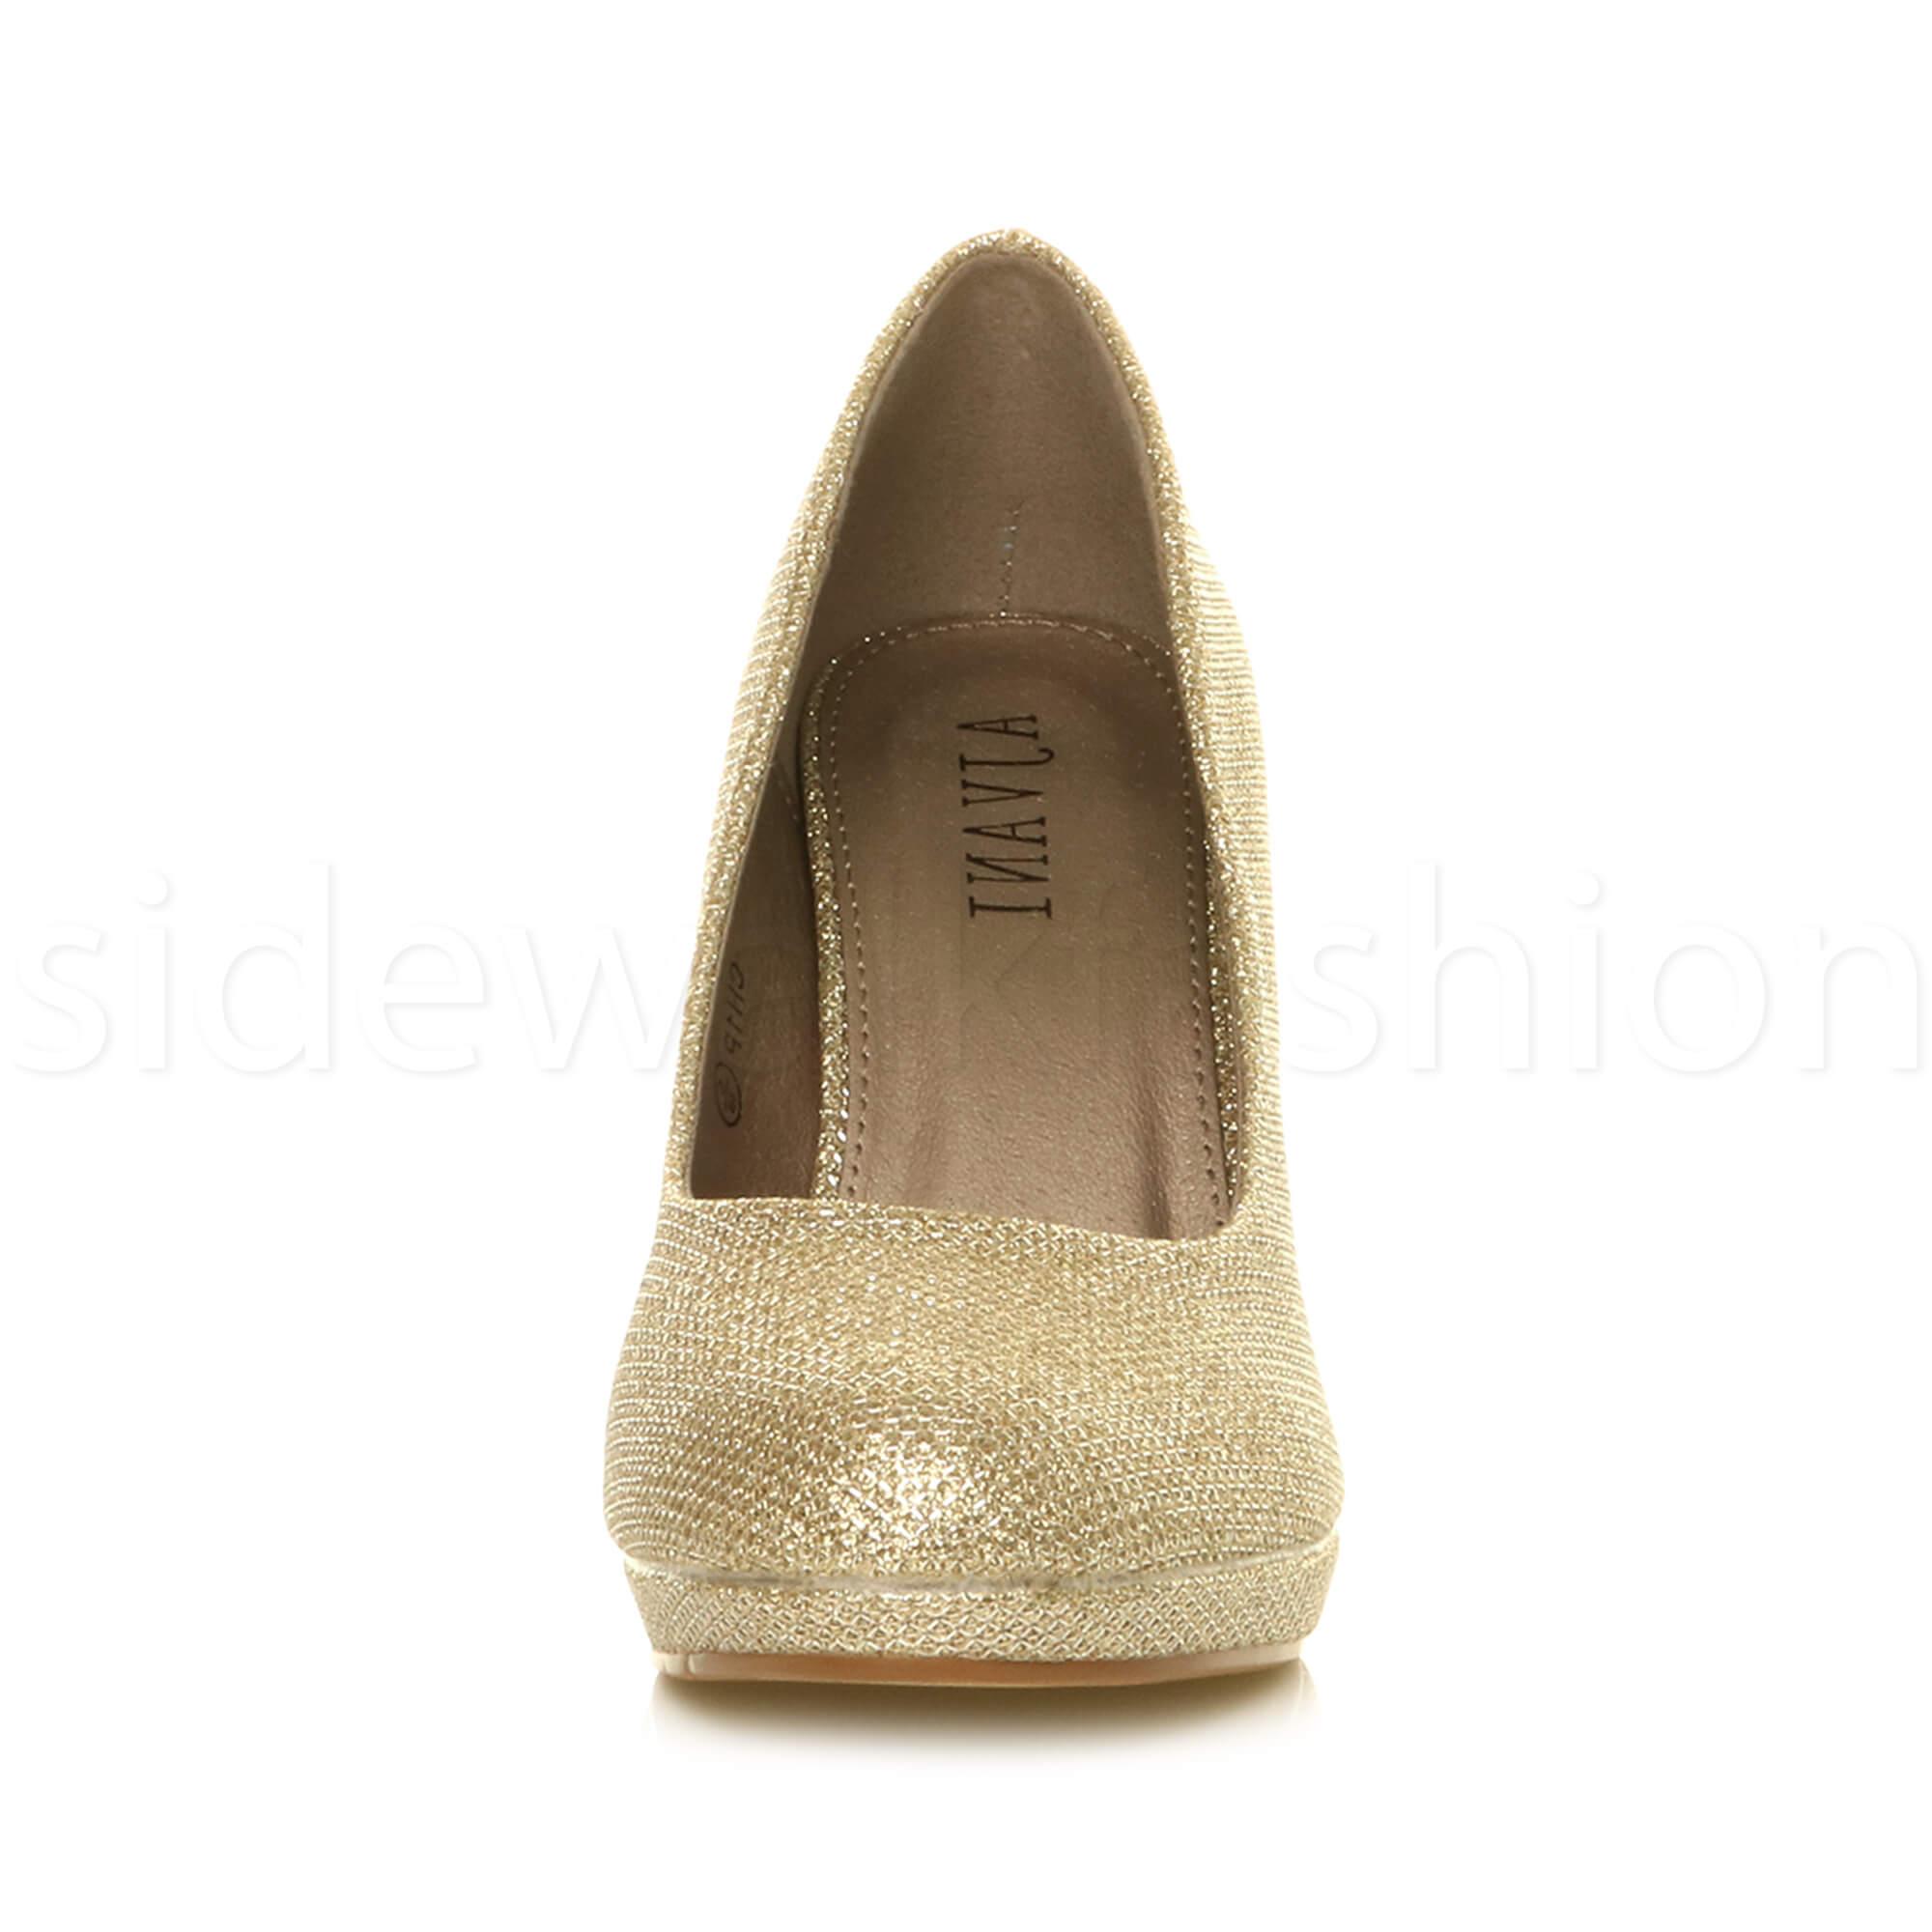 Womens-ladies-high-mid-heel-platform-wedding-evening-bridesmaid-court-shoes-size thumbnail 69